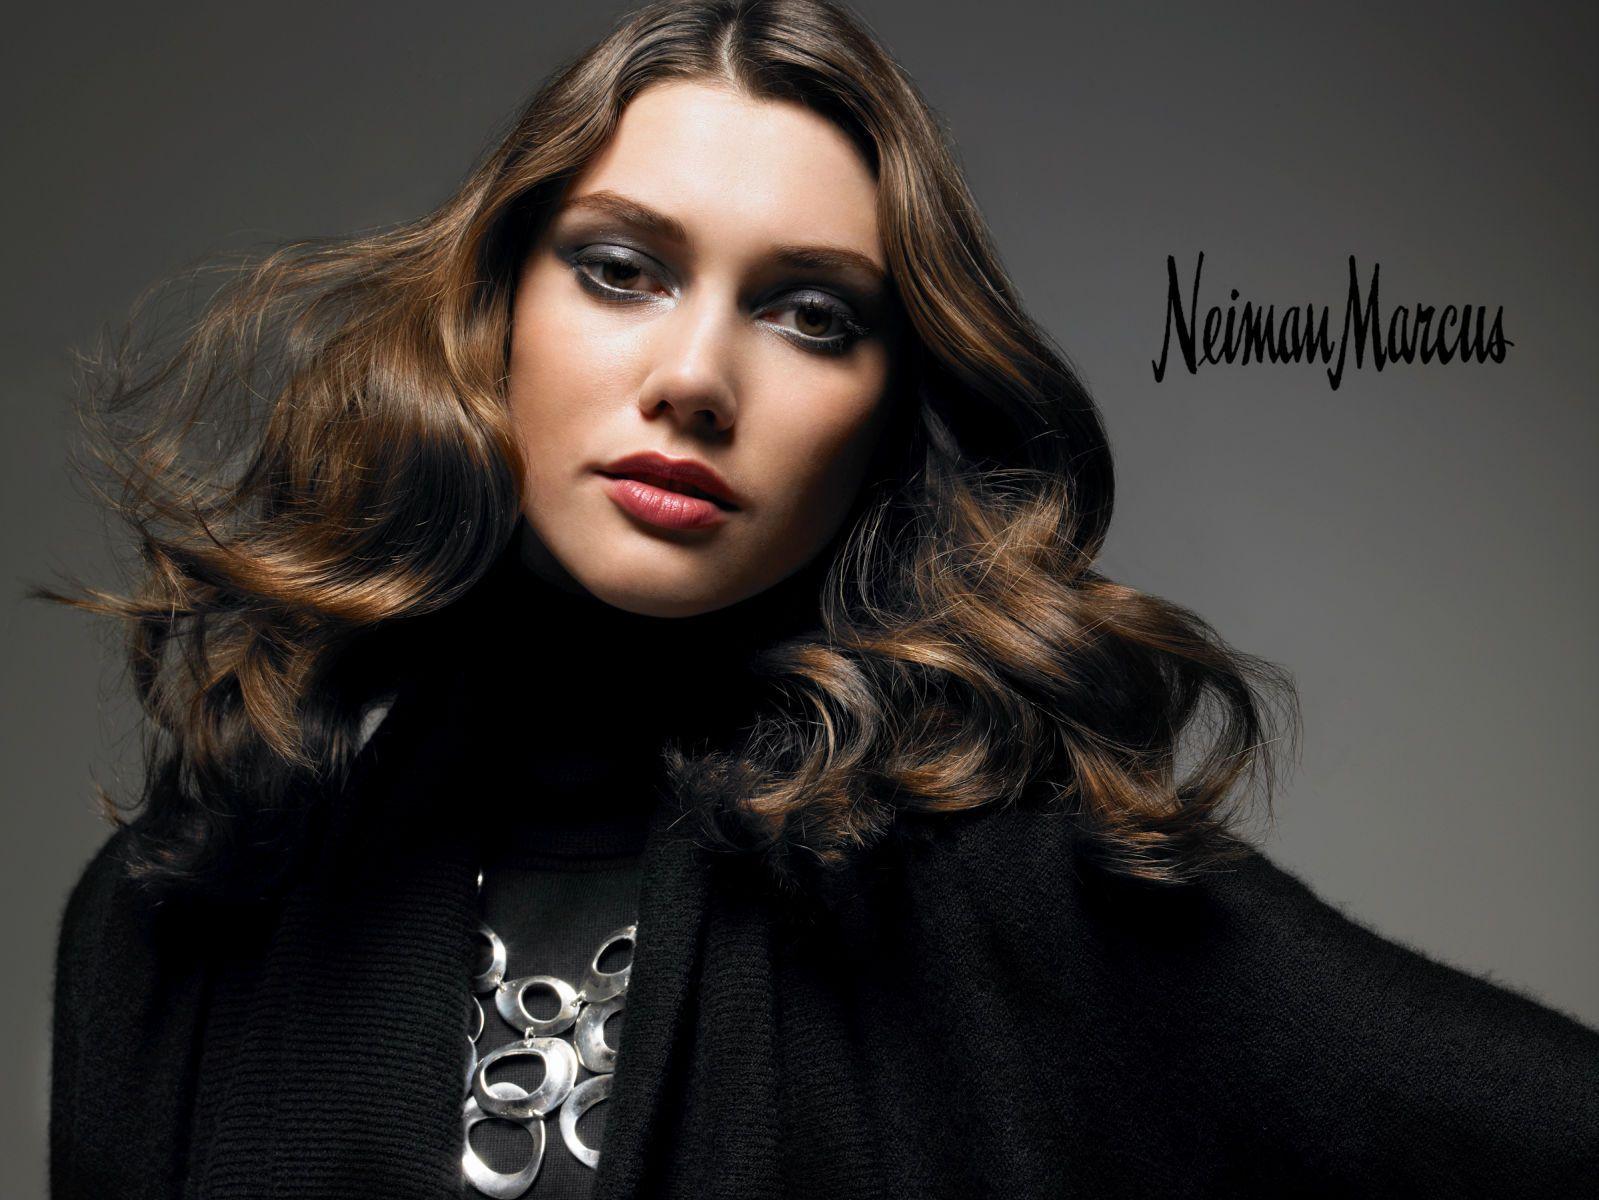 Donna Karan for Neiman Marcus